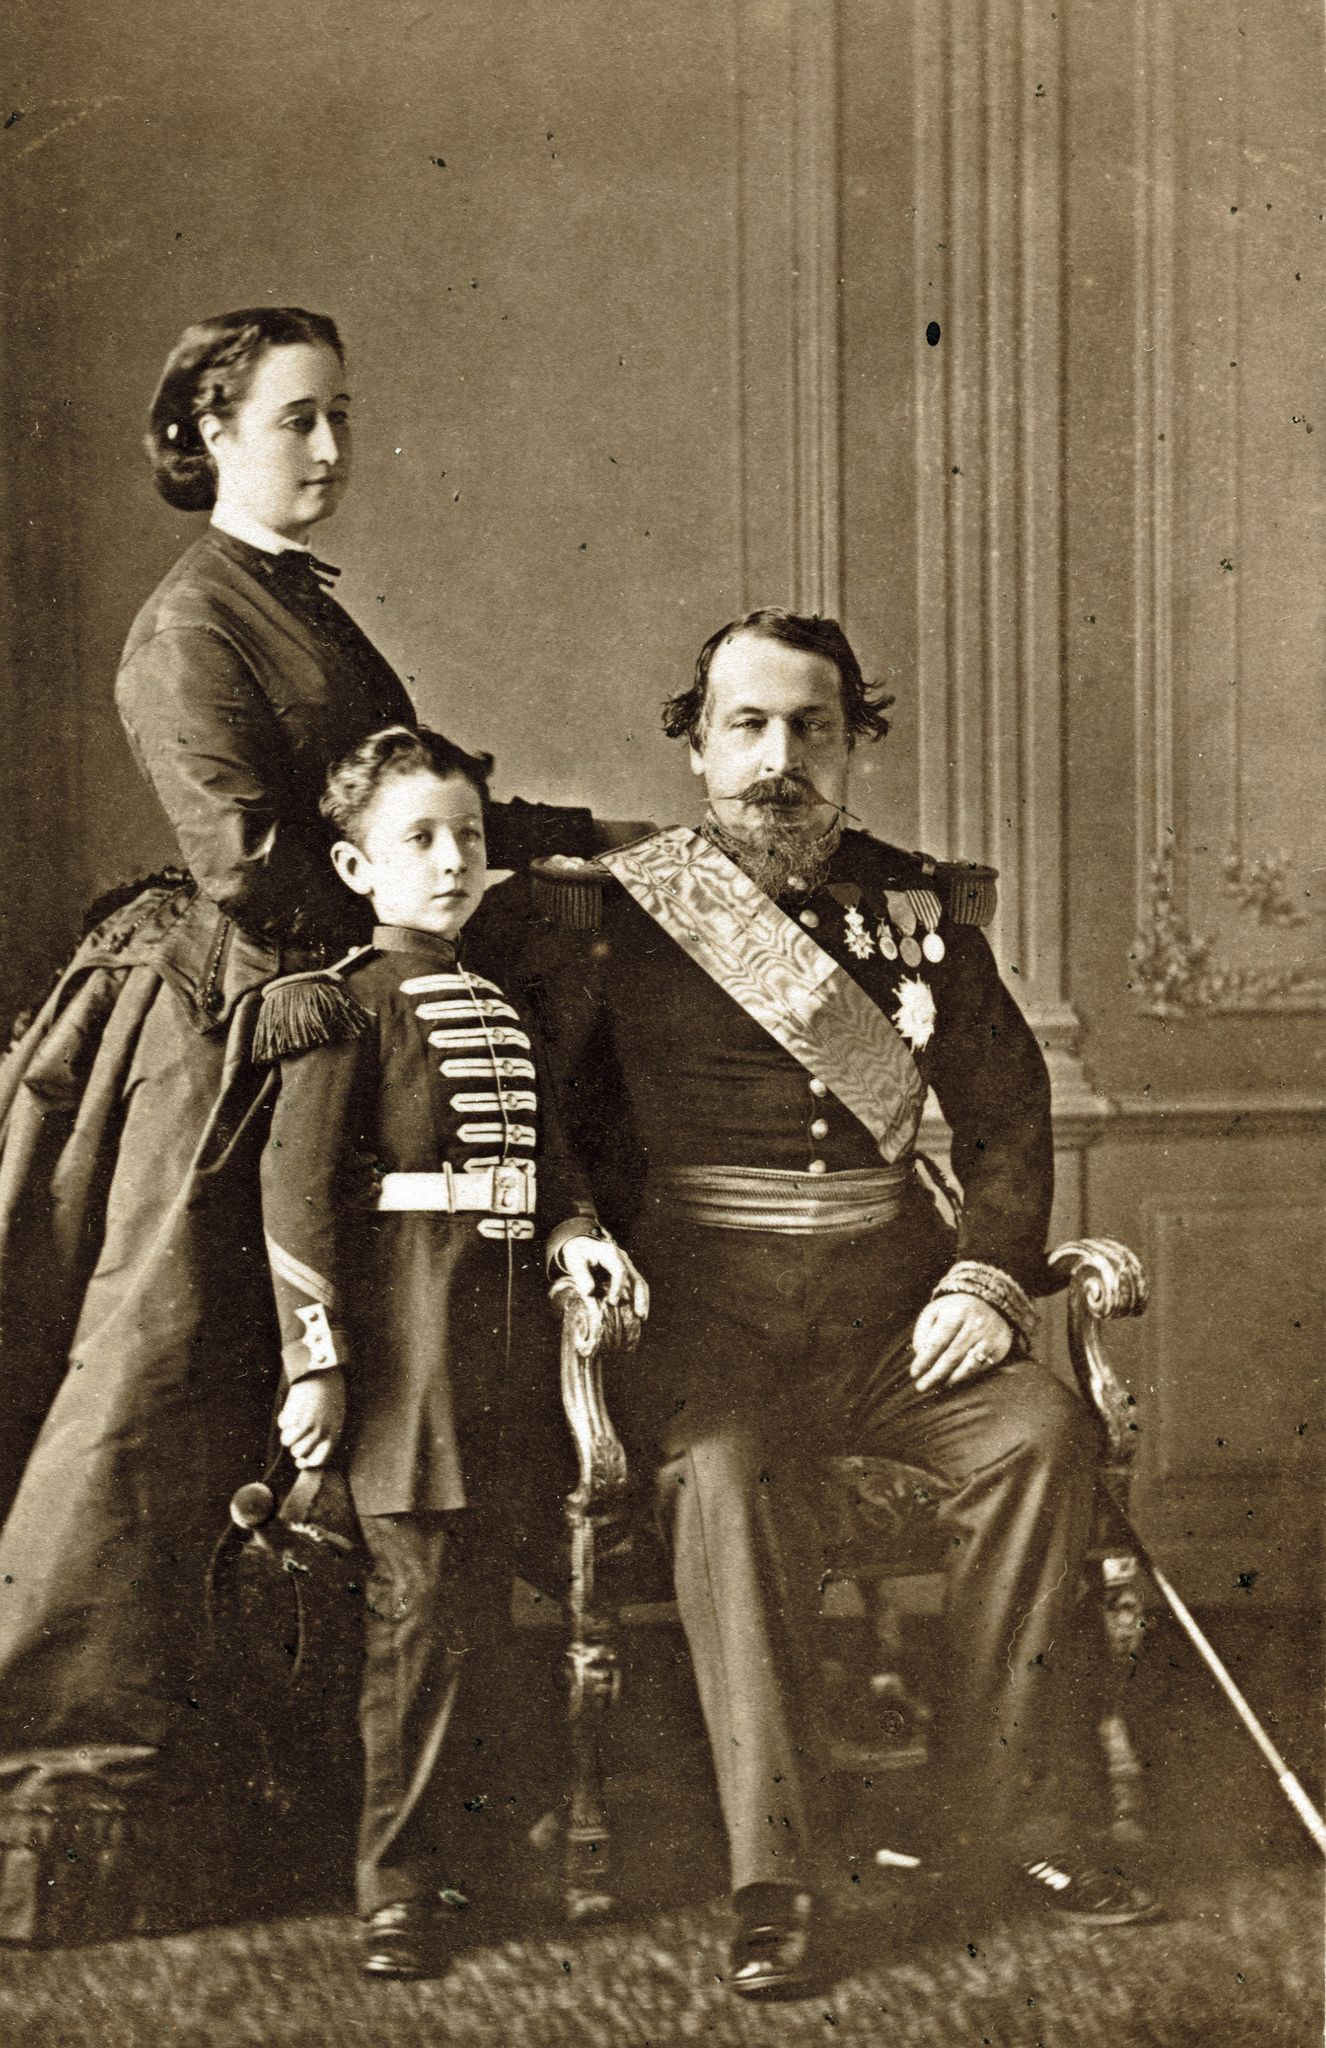 Serge Lovich Levitsky - Emperor Napoleon III and Family, 1860